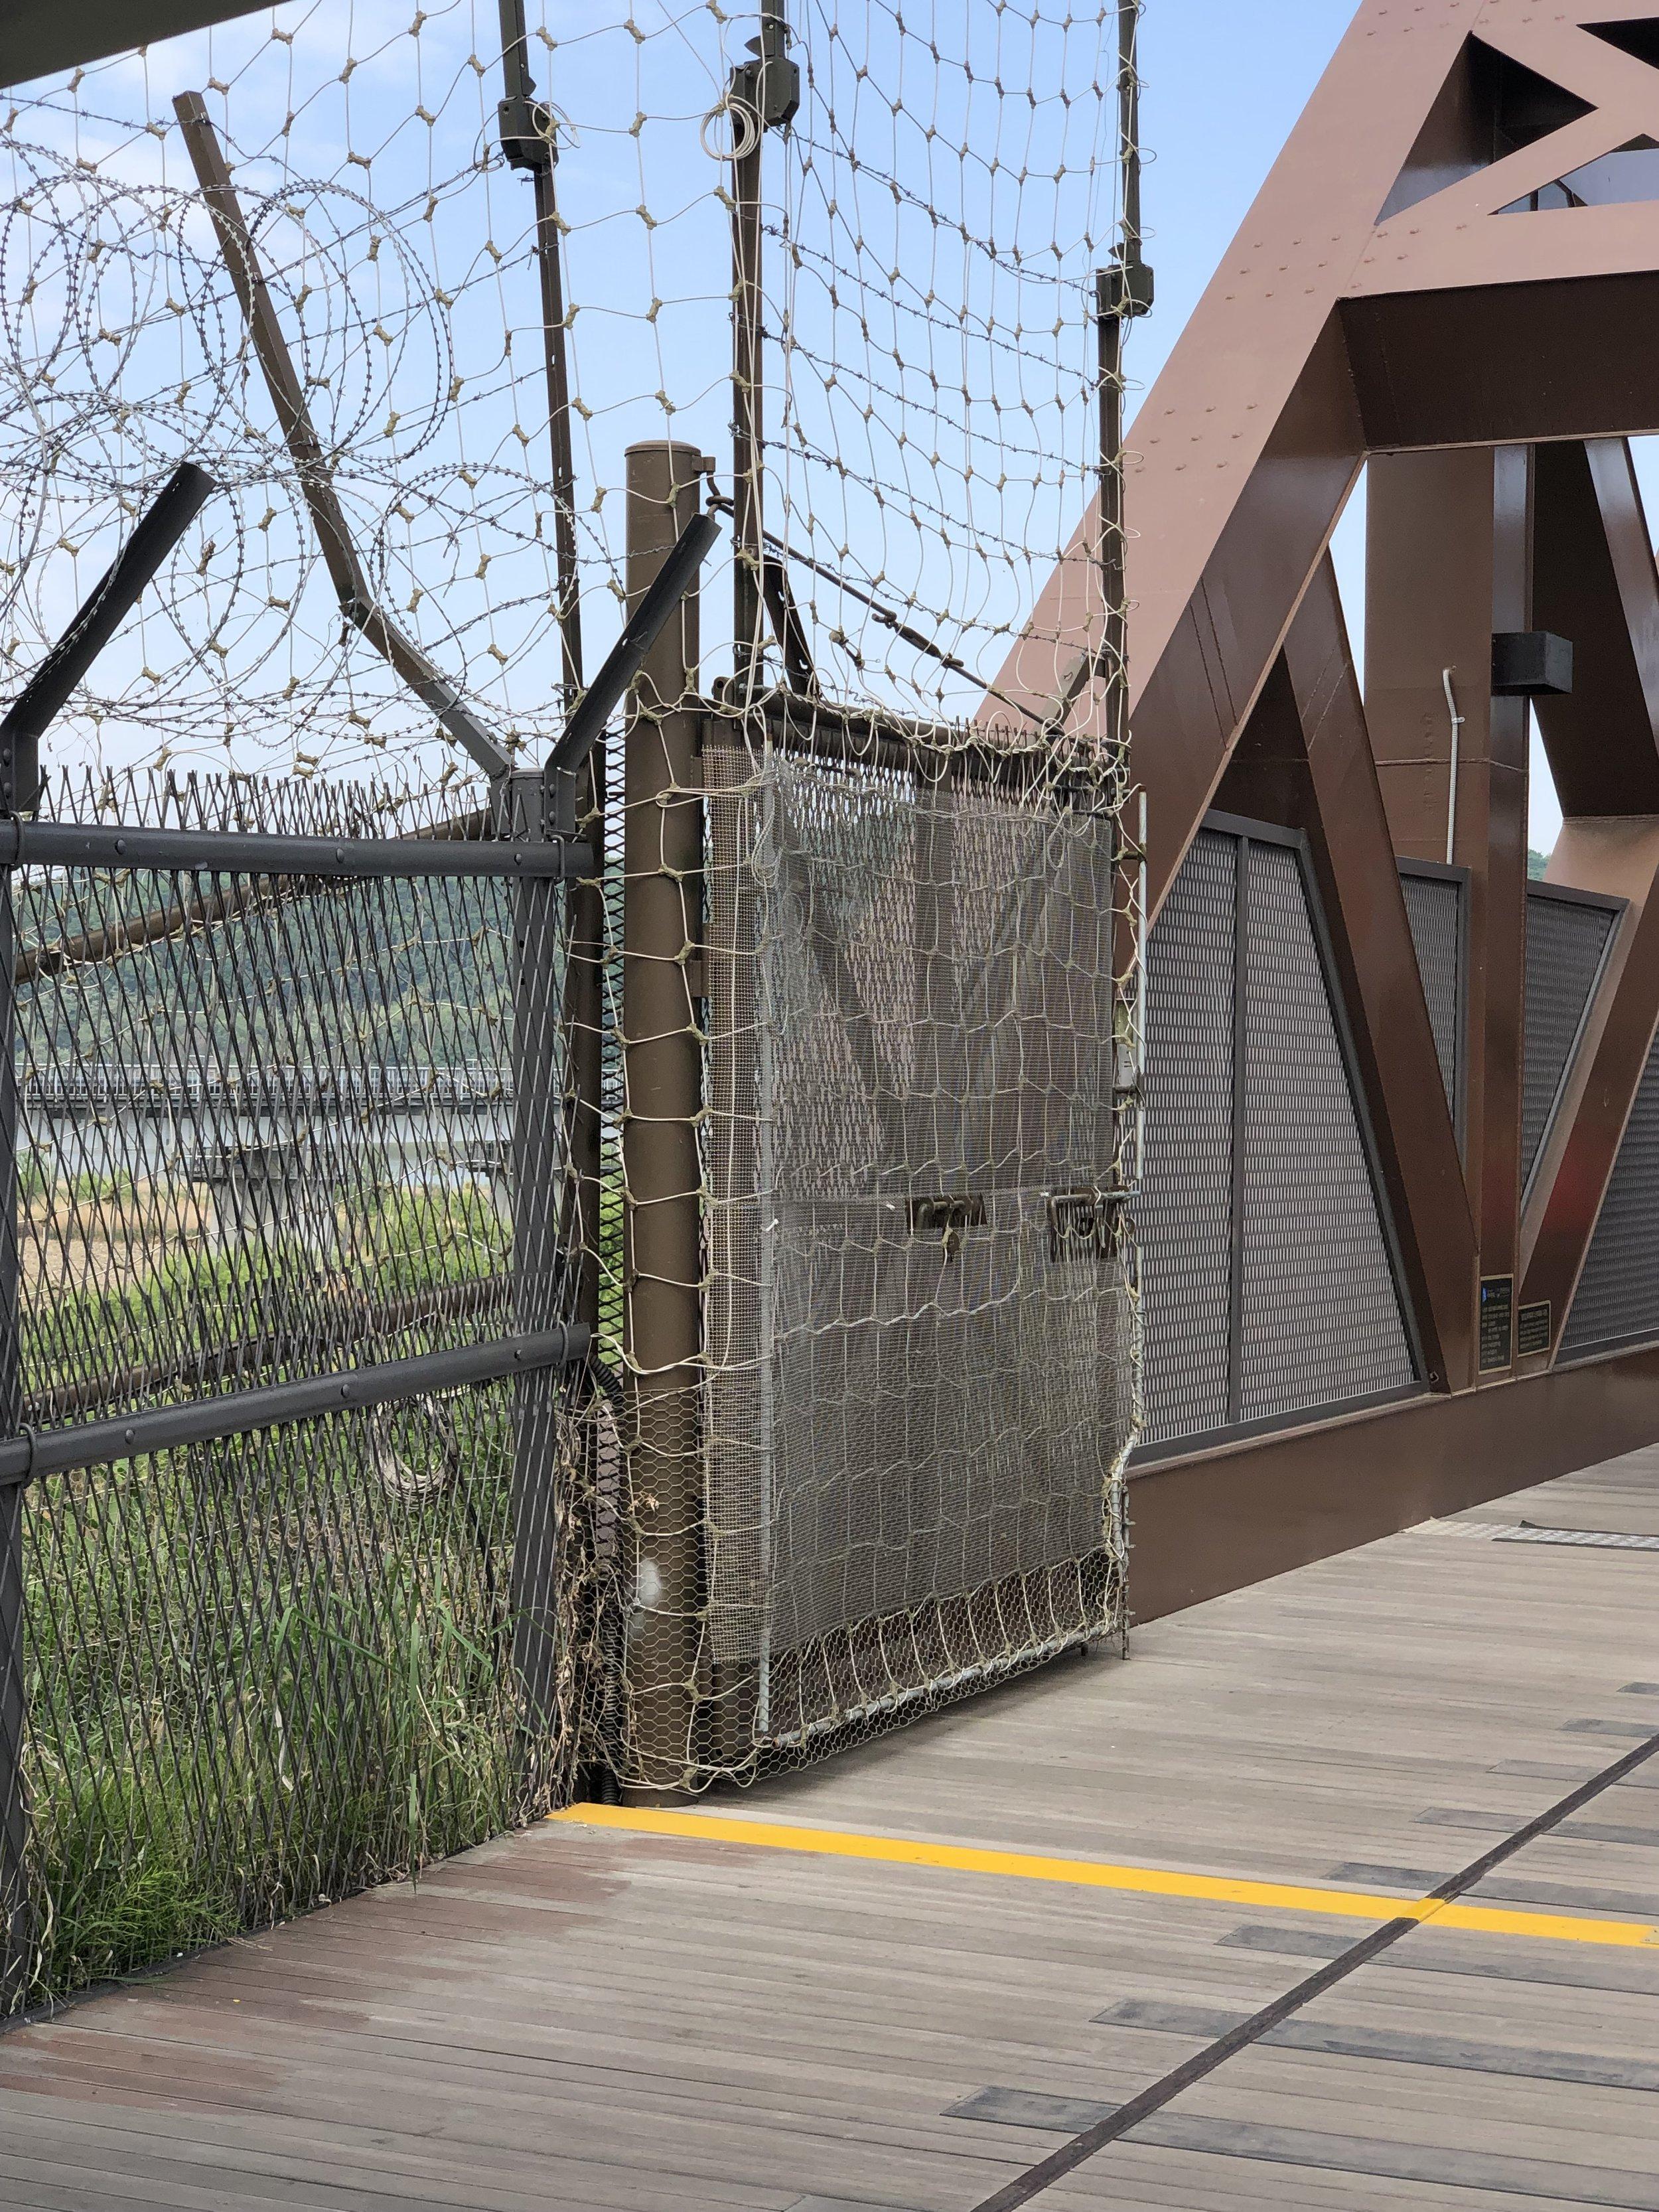 The original bridge to the North (DMZ)